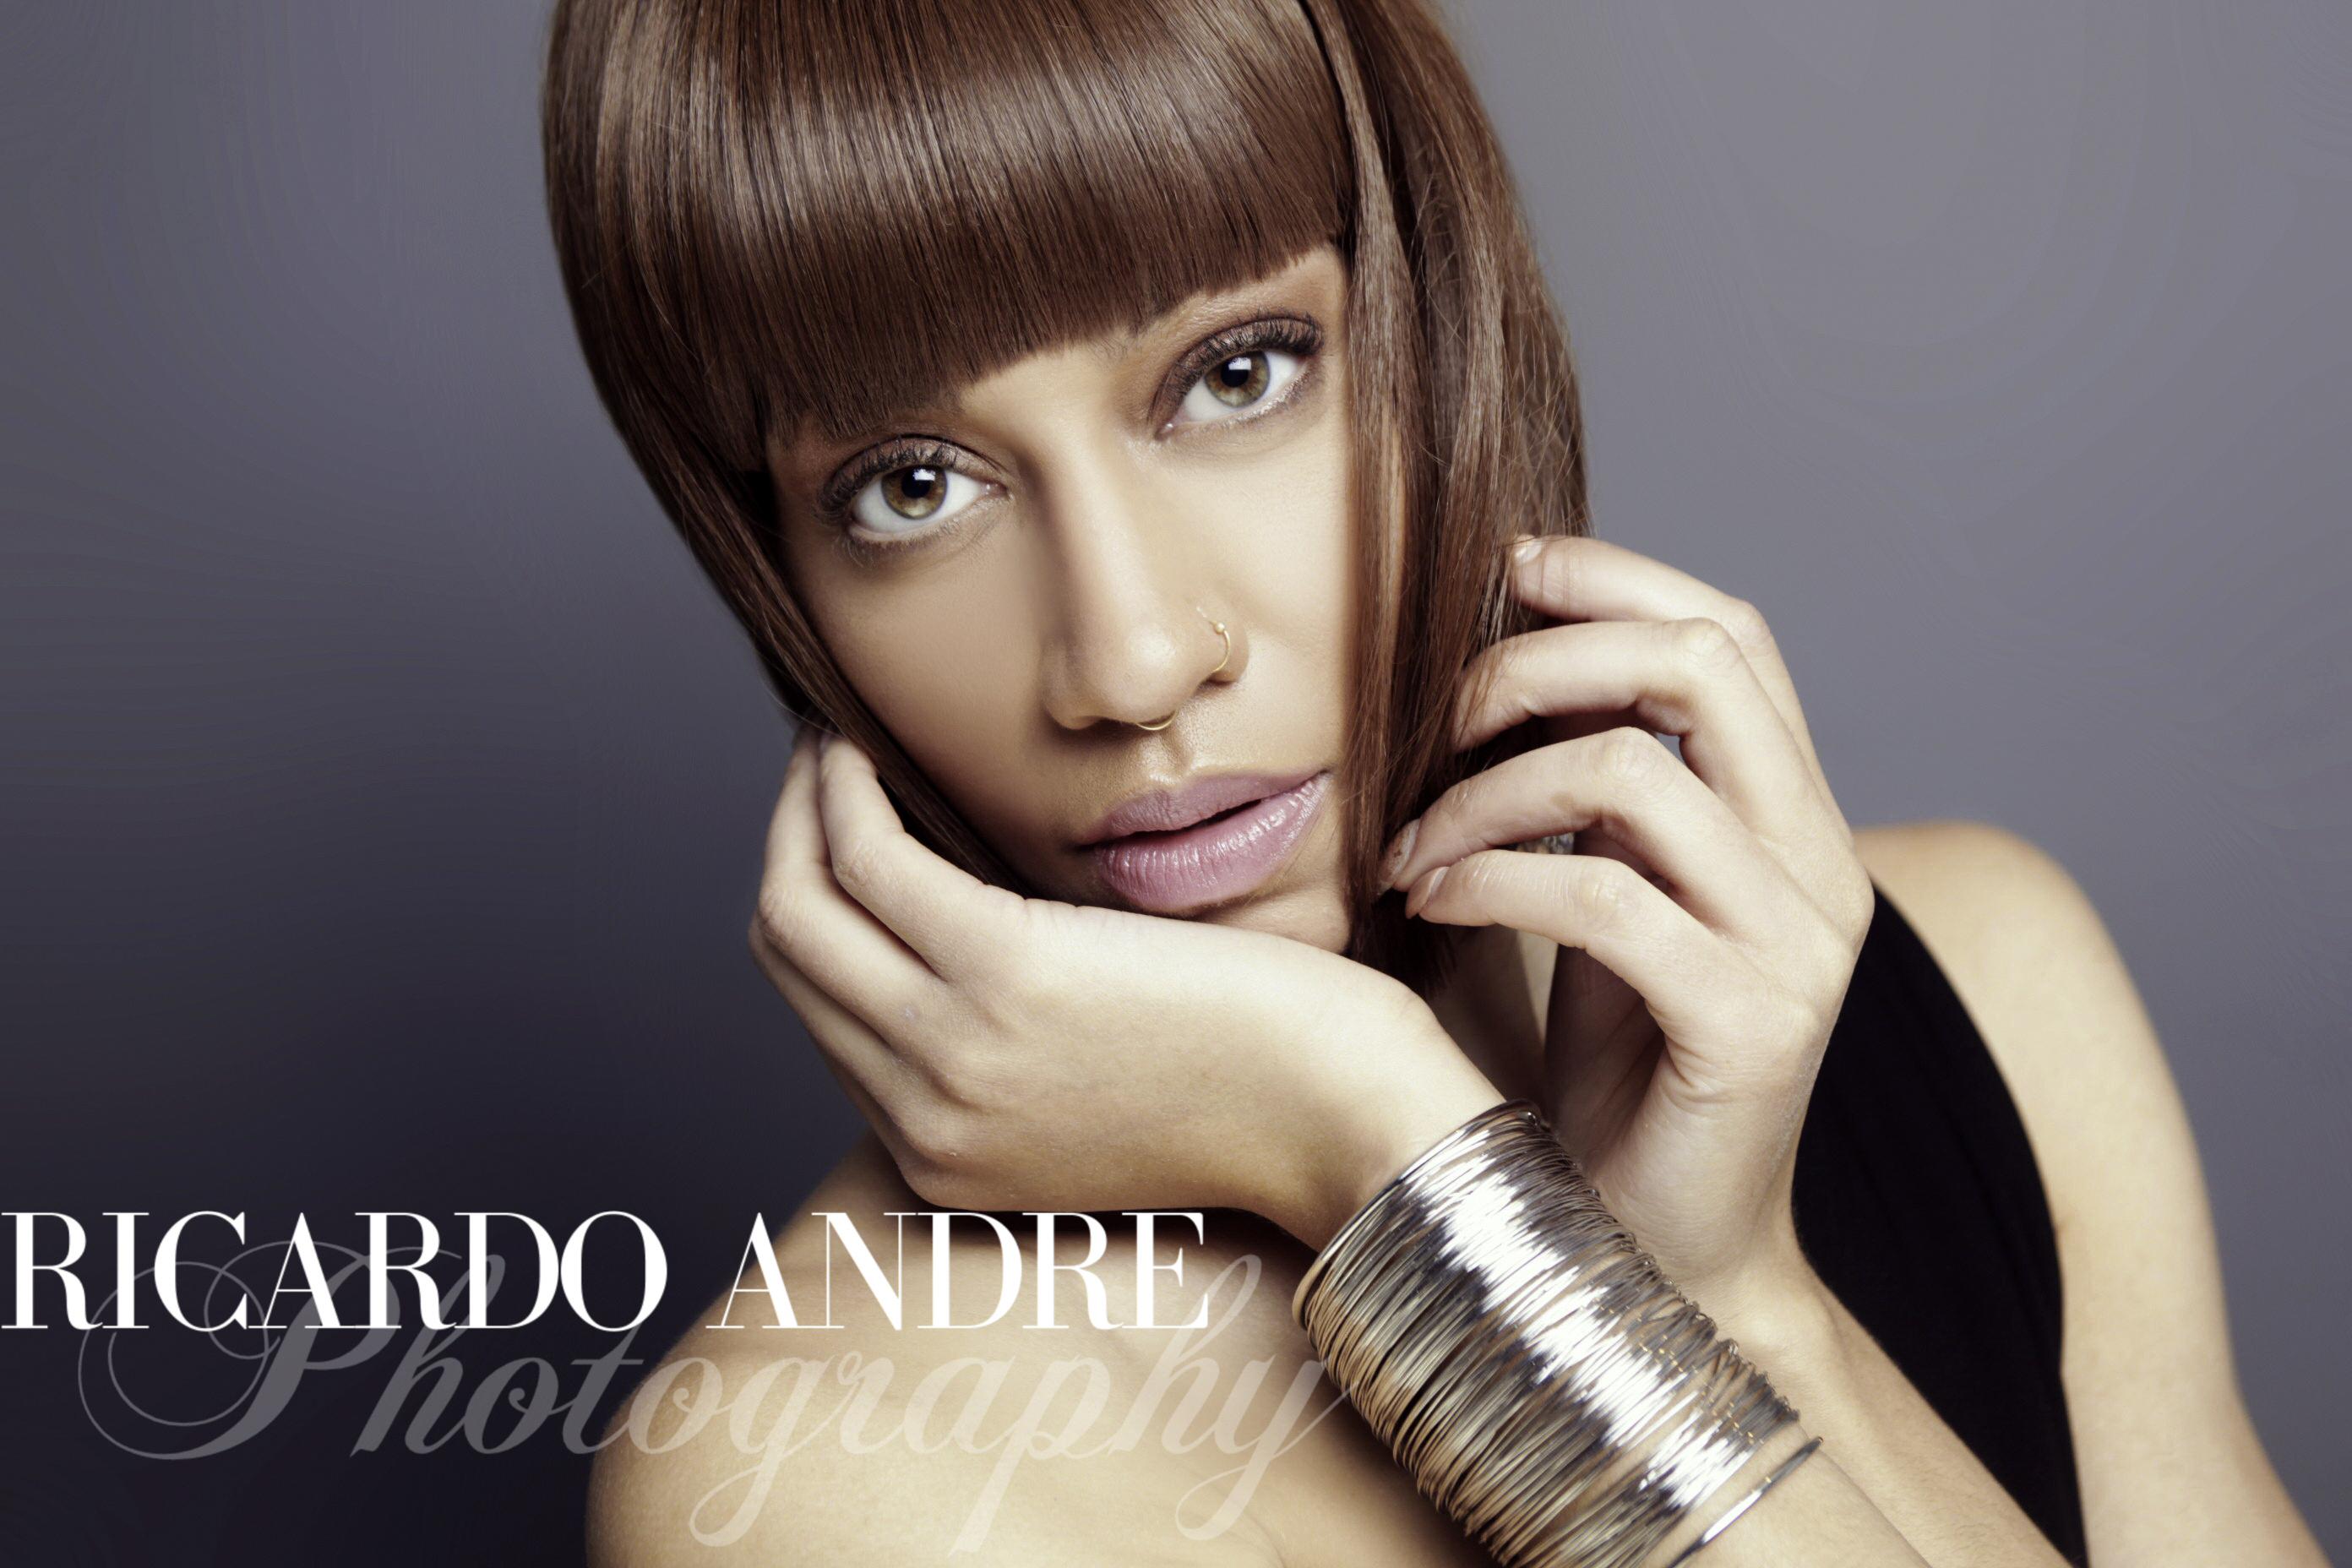 Ricardo andre, boudoir, photography, plus size, plus size boudoir